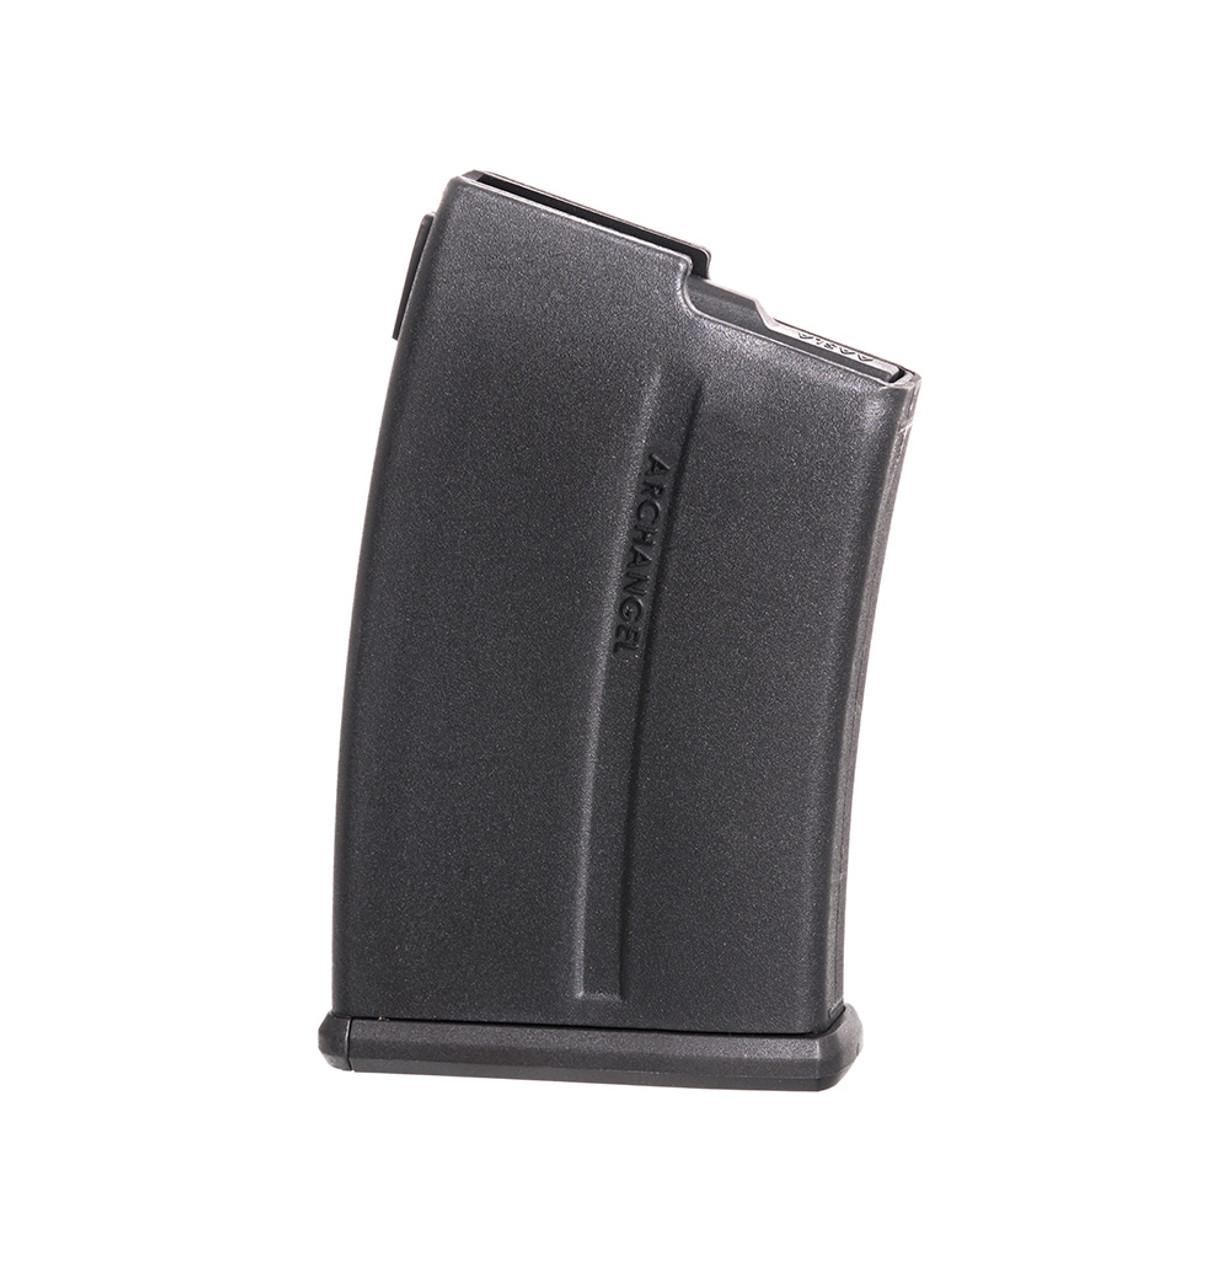 Archangel® Magnum Caliber .300 WIN, 7mm Remington® Magnum Magazine for the AA700MLA & AA1500MLA Stocks (17) Rd - Black Polymer